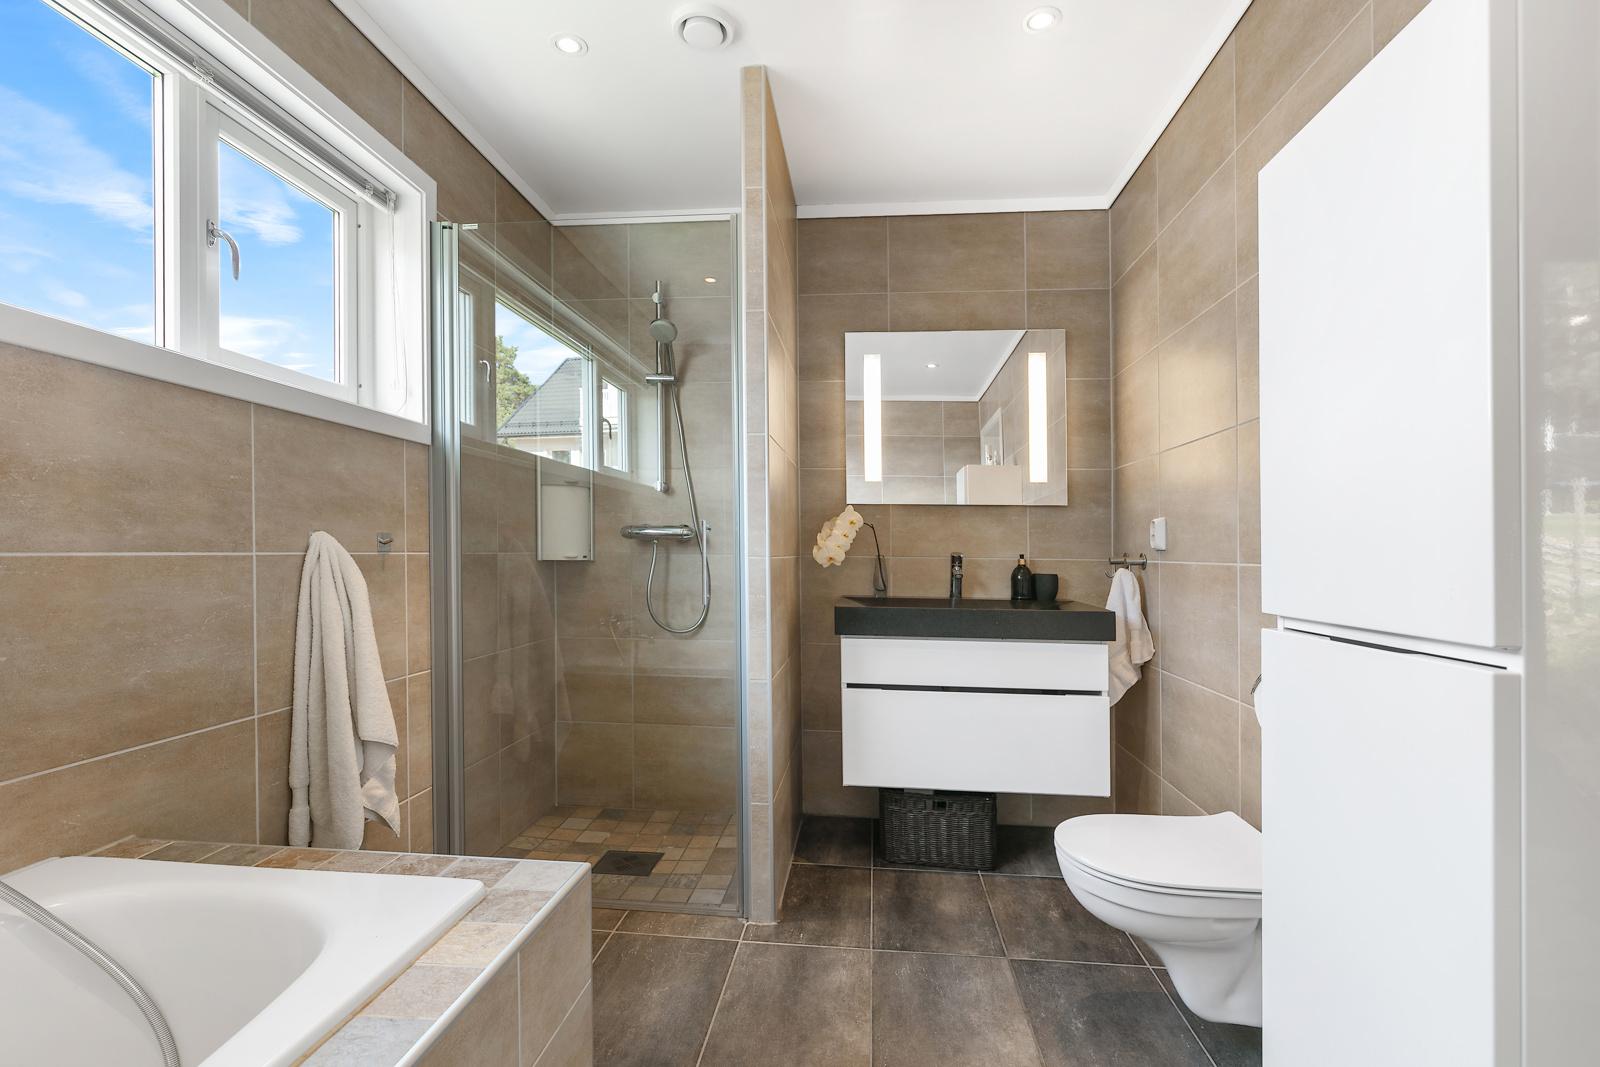 Badekar, dusjnisje og vegghengt wc